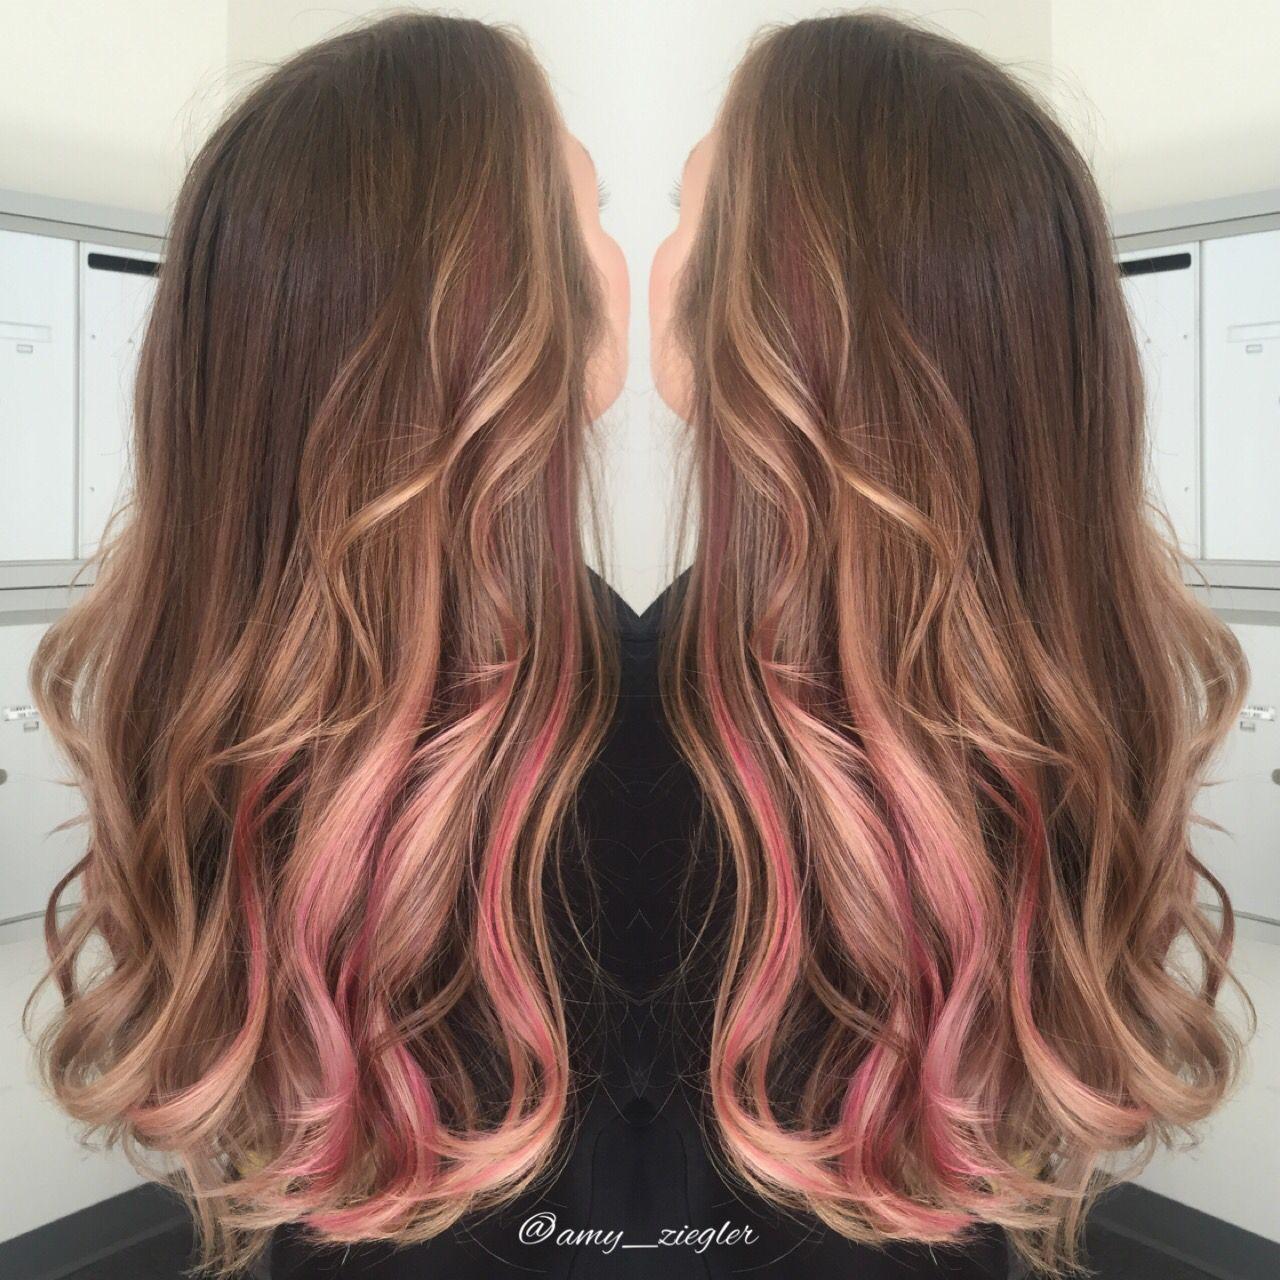 Soft Pink Peekaboo With Blonde Balayage By Amy Ziegler Askforamy Versatilestrands Pink Hair Tips Pink Hair Highlights Blonde Balayage